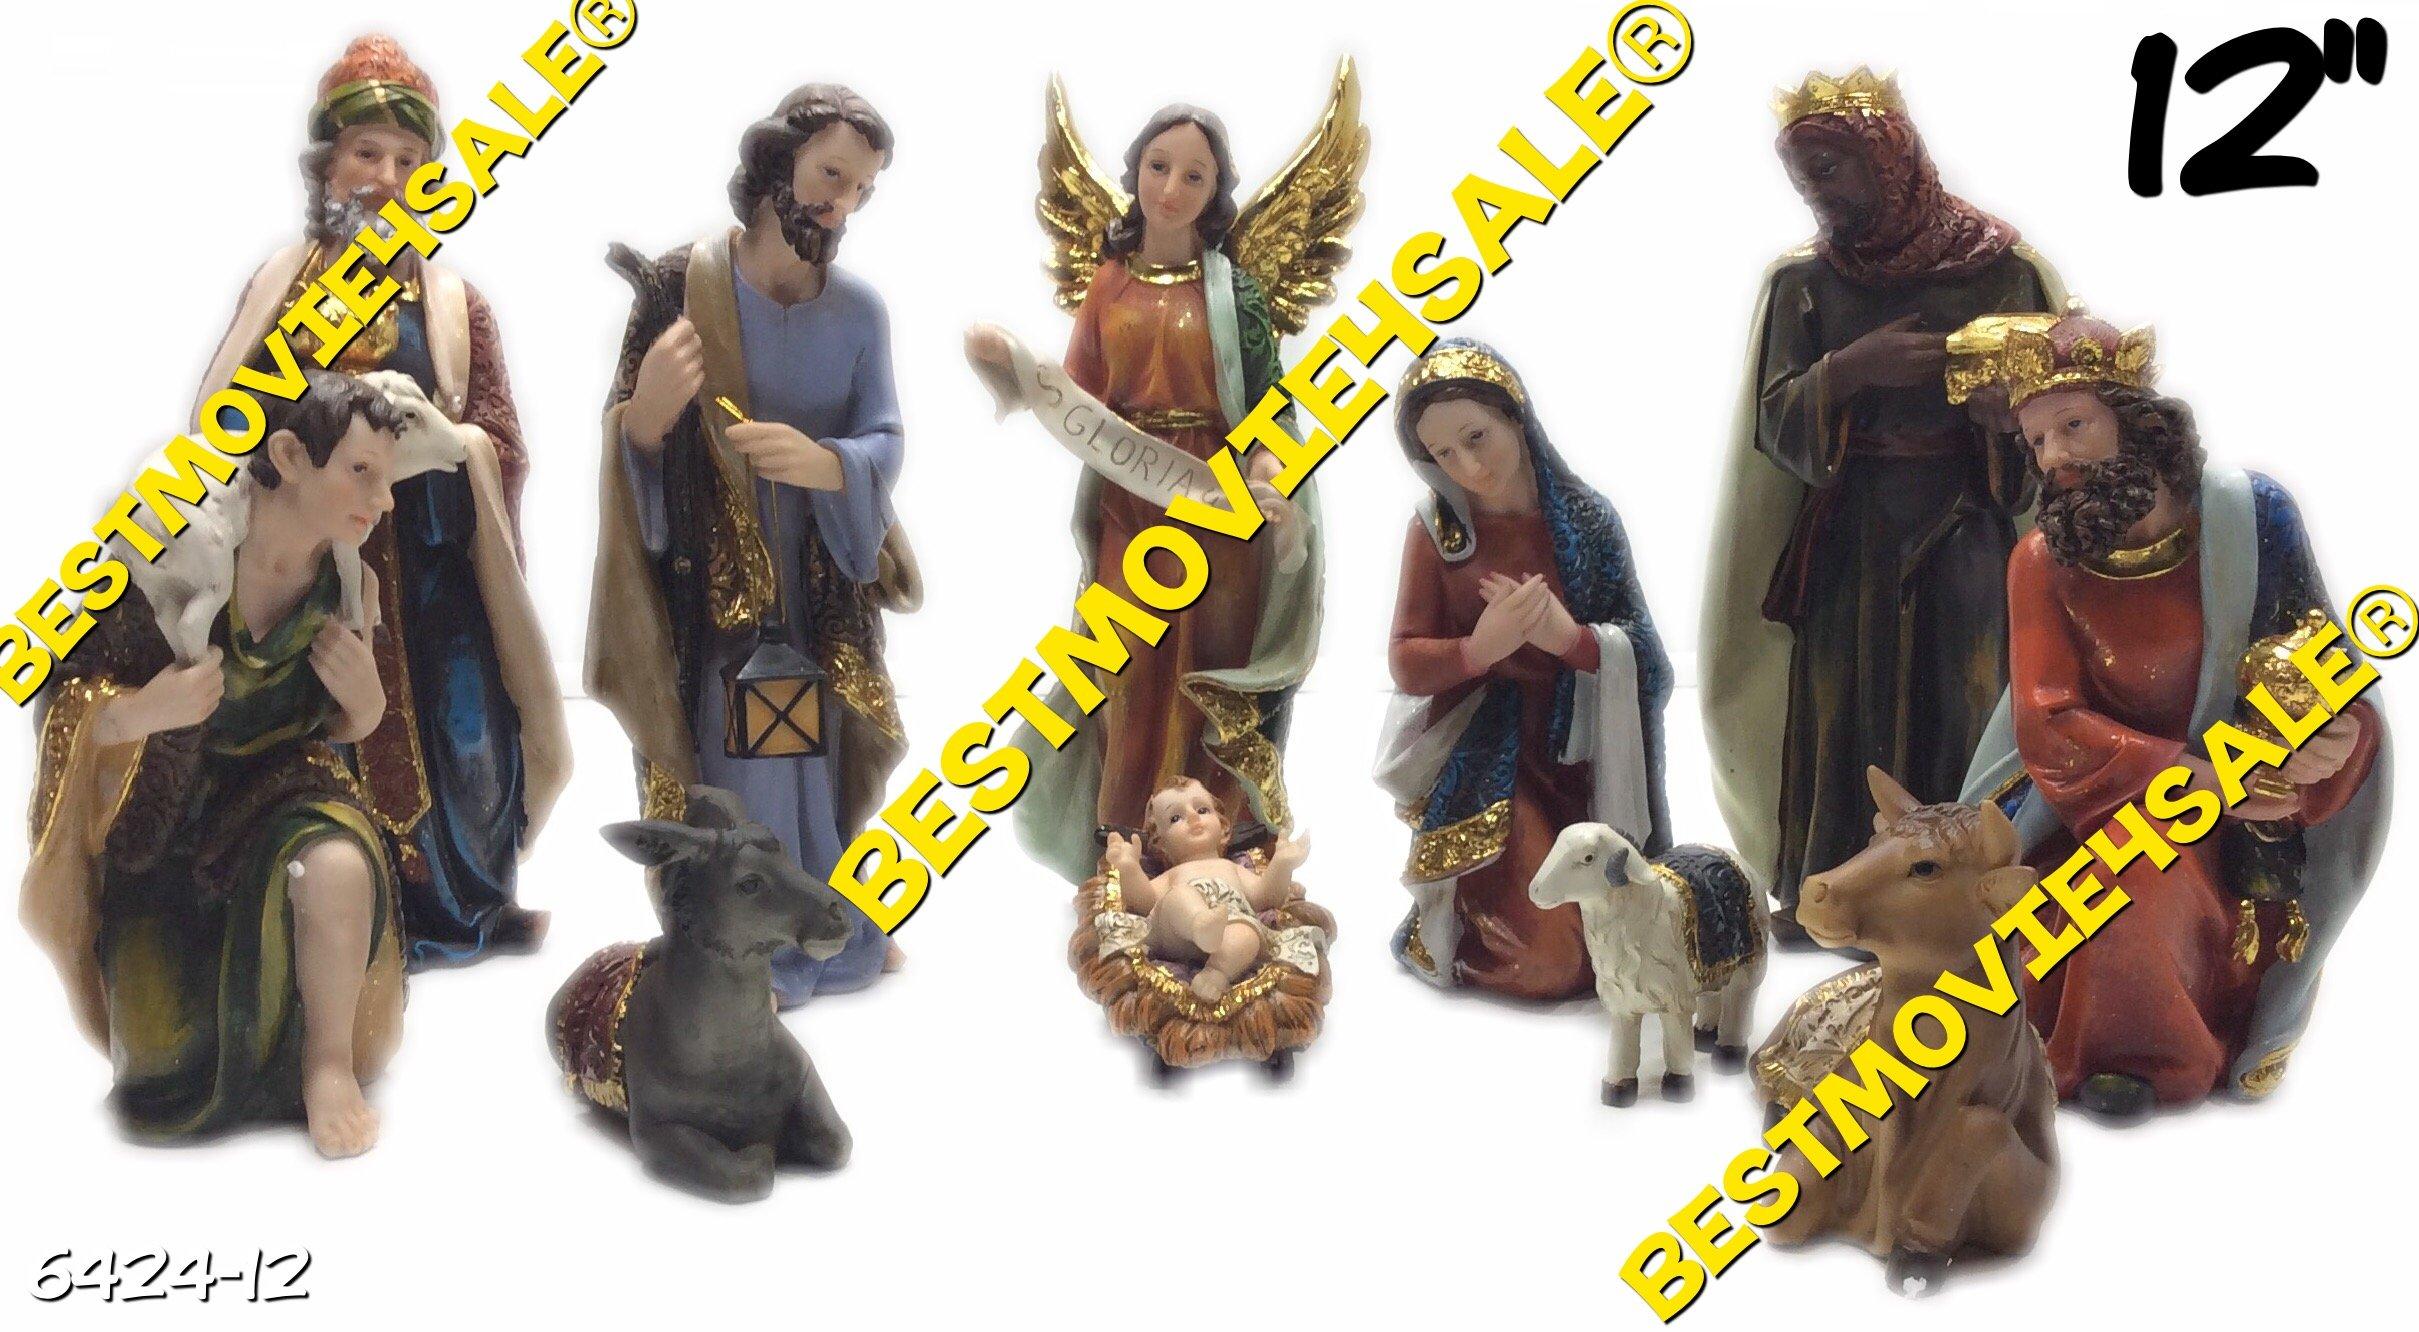 12 Inch Christmas Nativity Complete Set/11 Pieces -Nacimiento Navideno 11pcs New